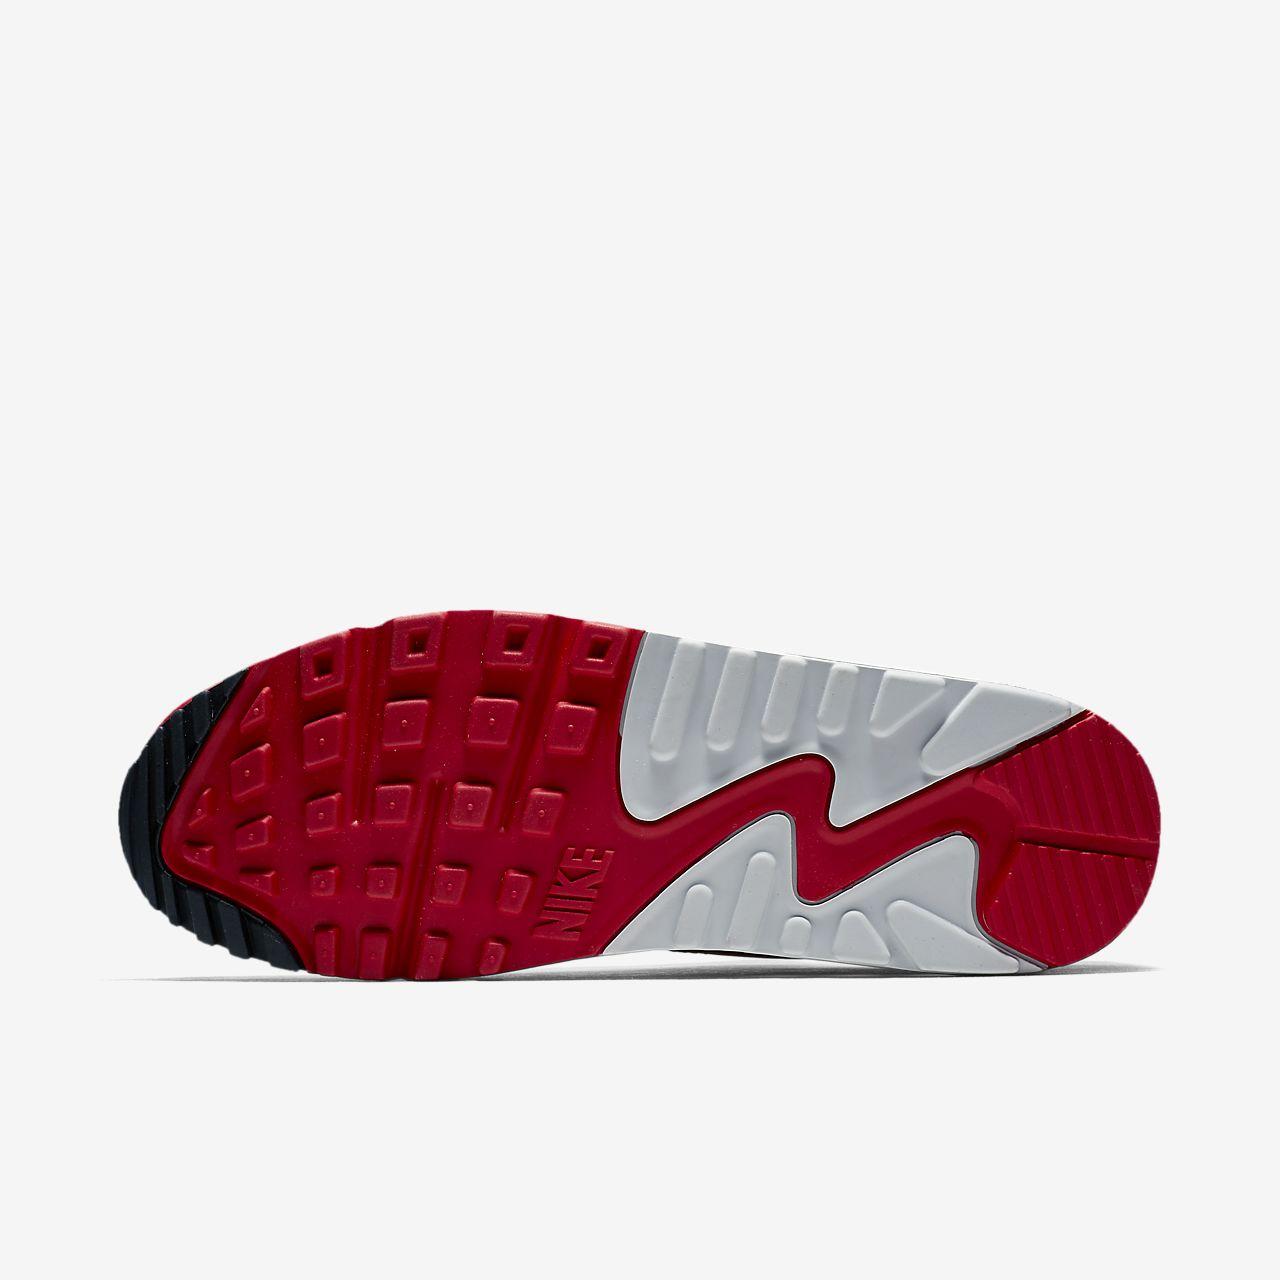 competitive price 735e6 df82d ... Nike Air Max 90 1 Men s Shoe